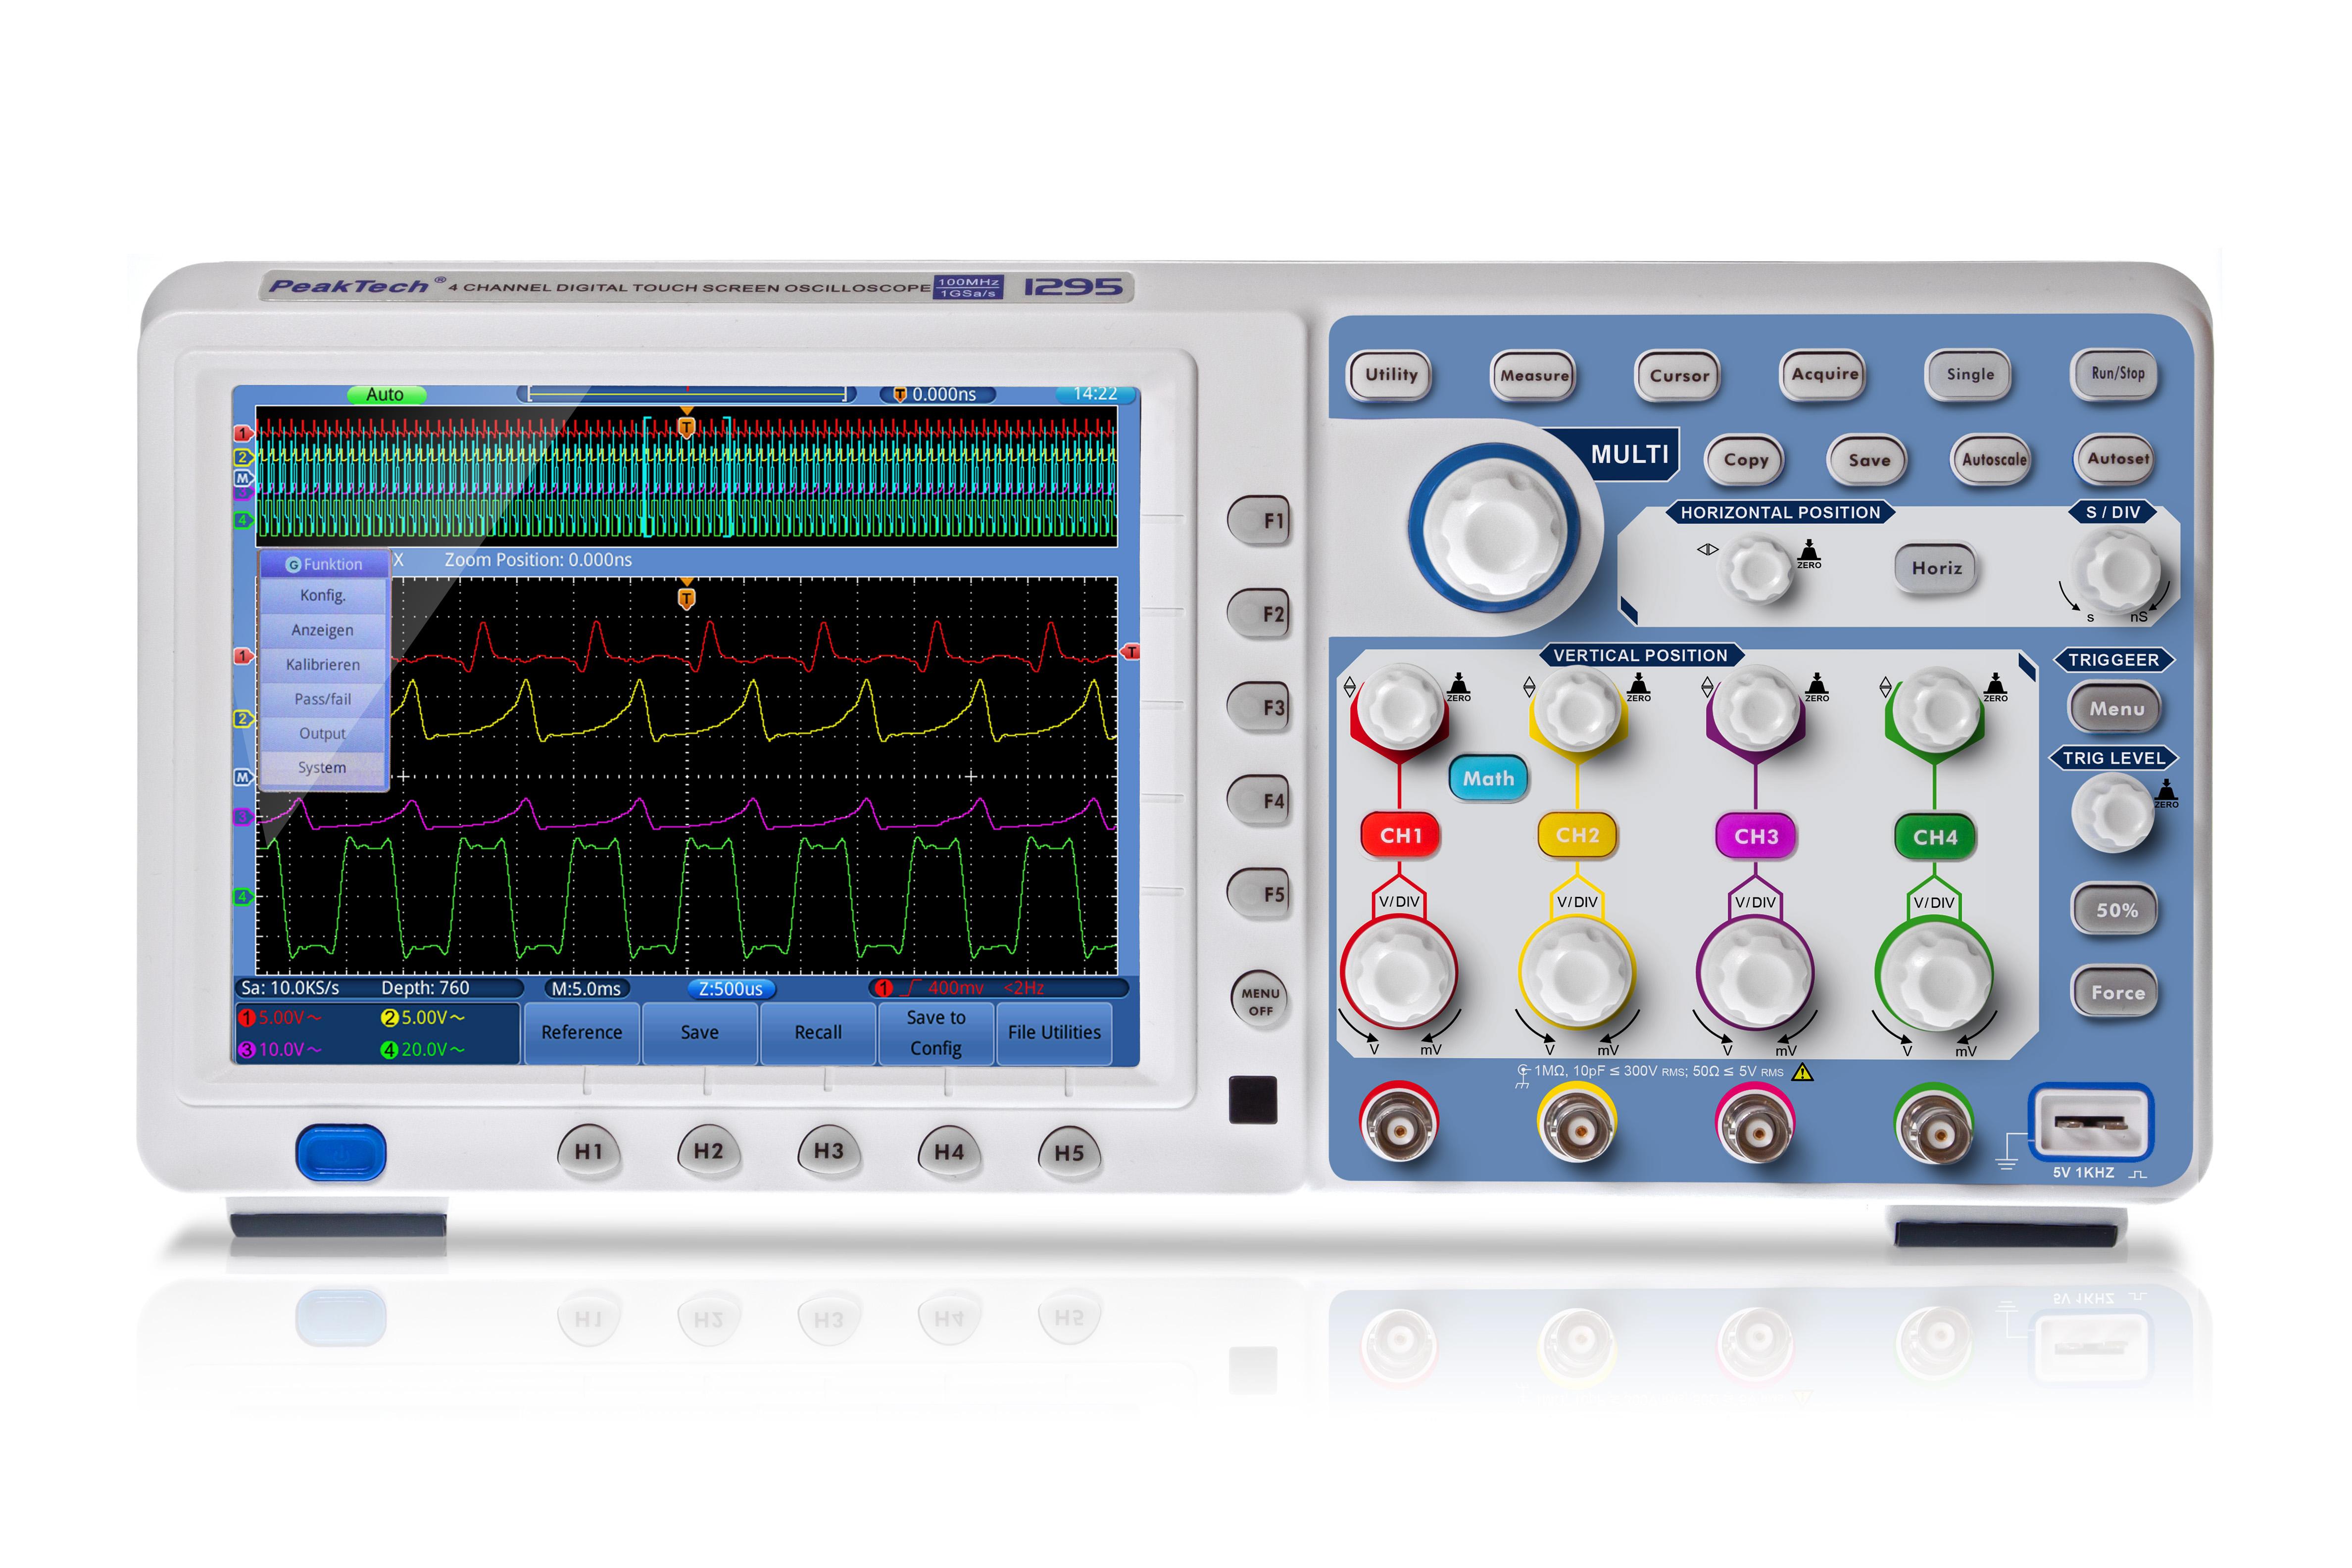 «PeakTech® P 1295» 100 MHz / 4 CH, 1 GS/s touchscreen oscilloscope